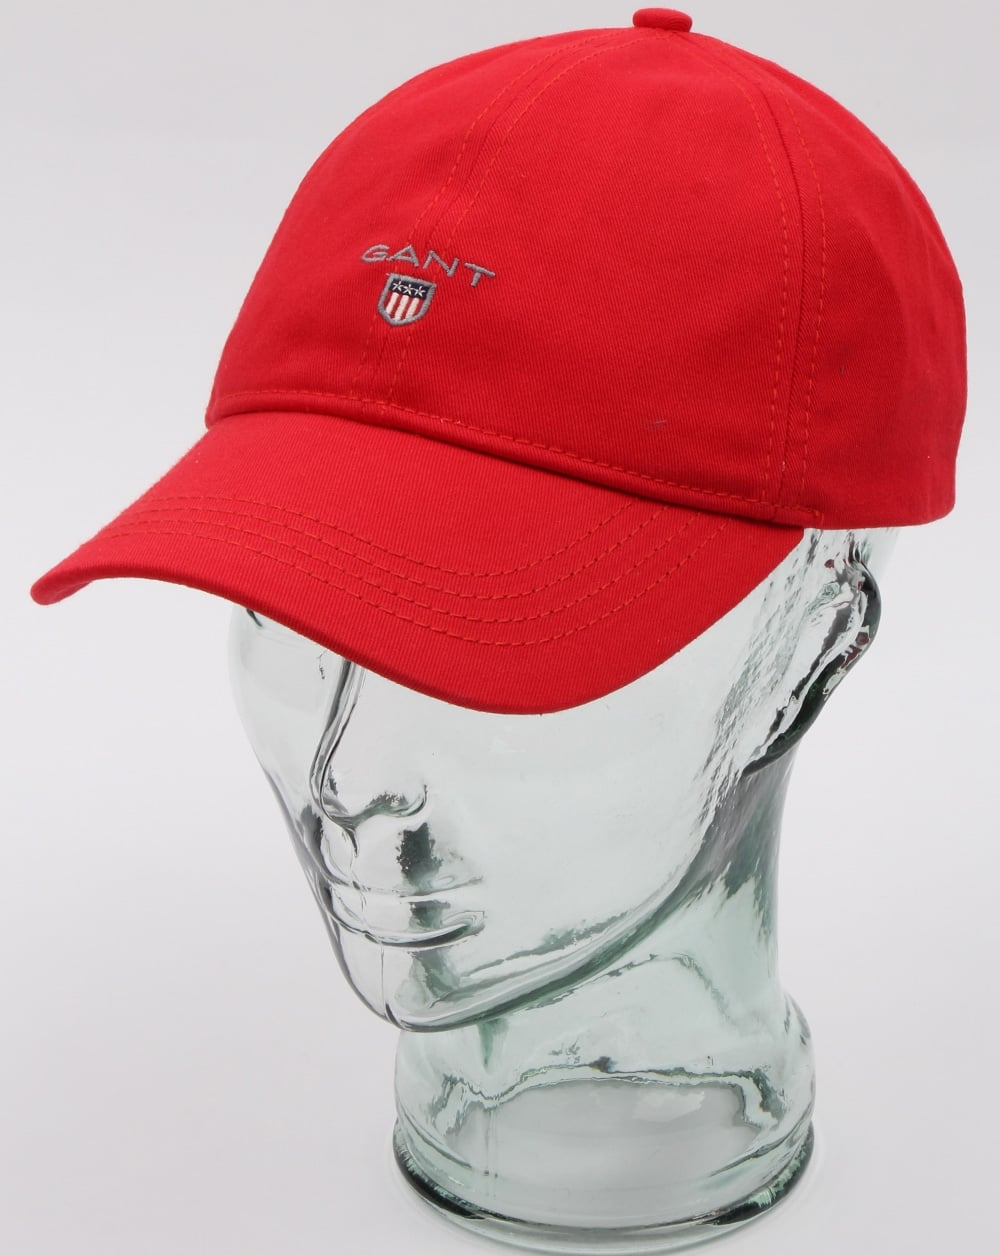 GANT Gant Cotton Twill Baseball Cap in Red curved peak hat